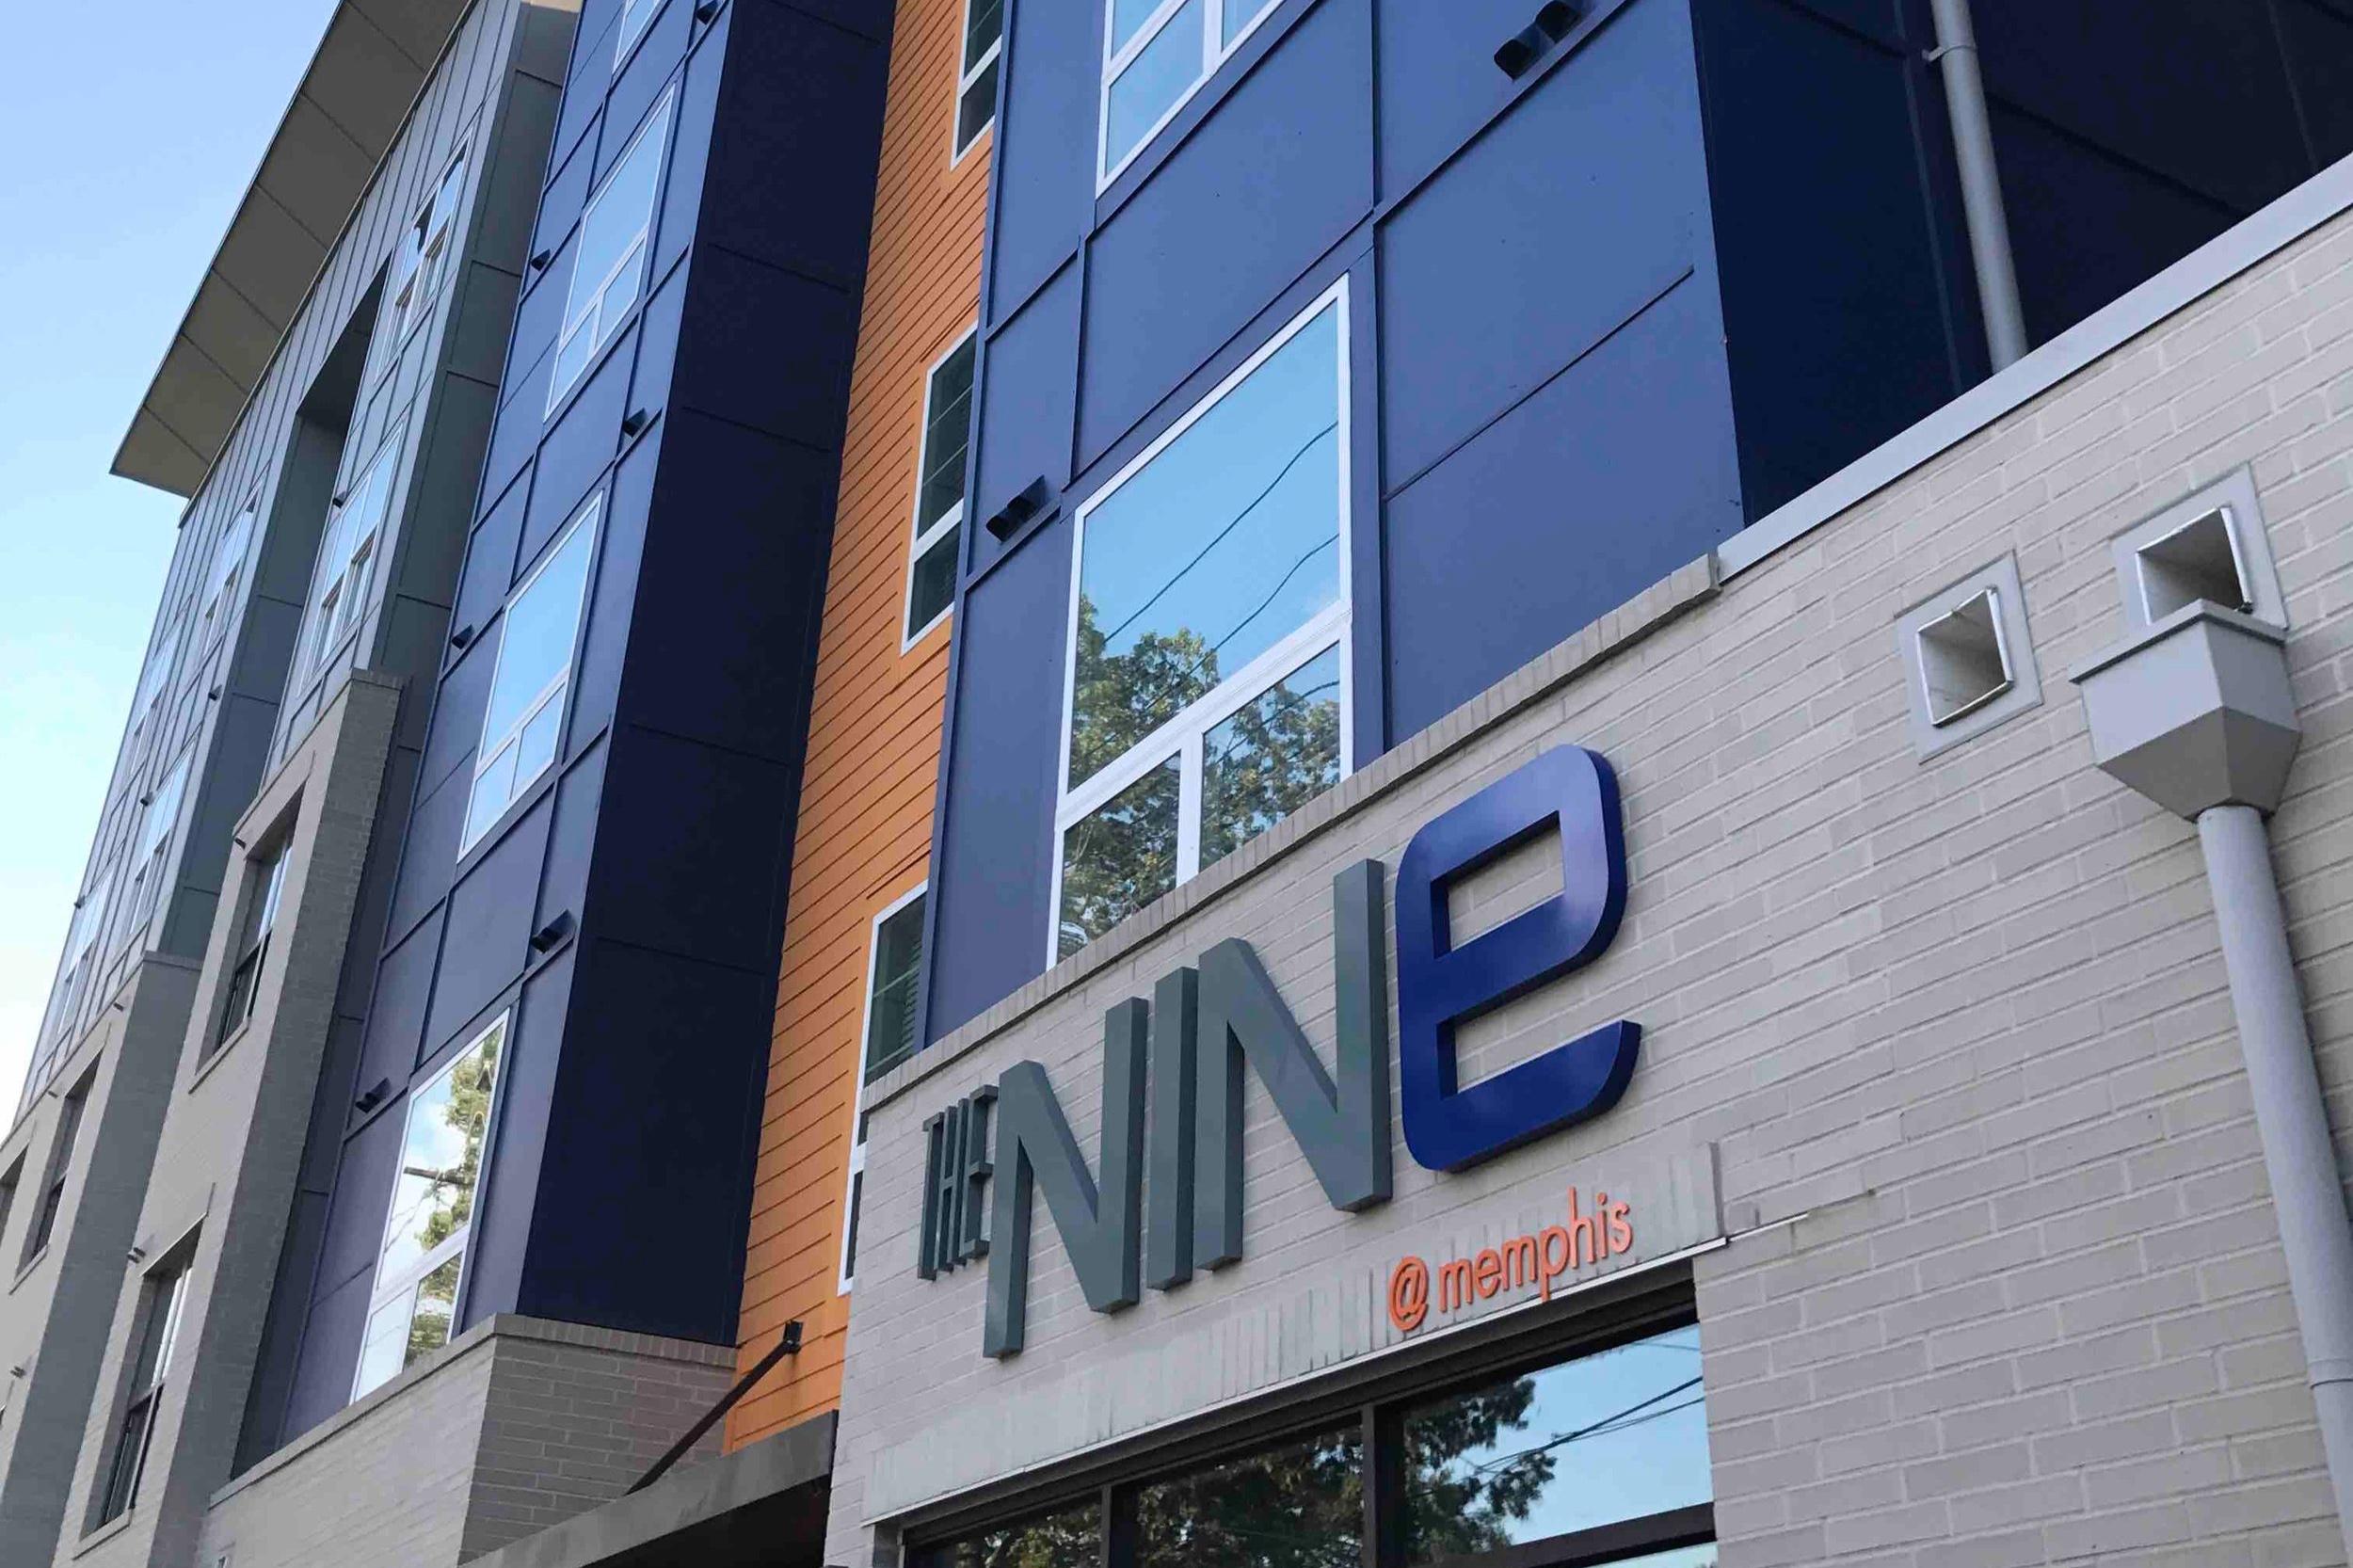 The Nine @ Memphis